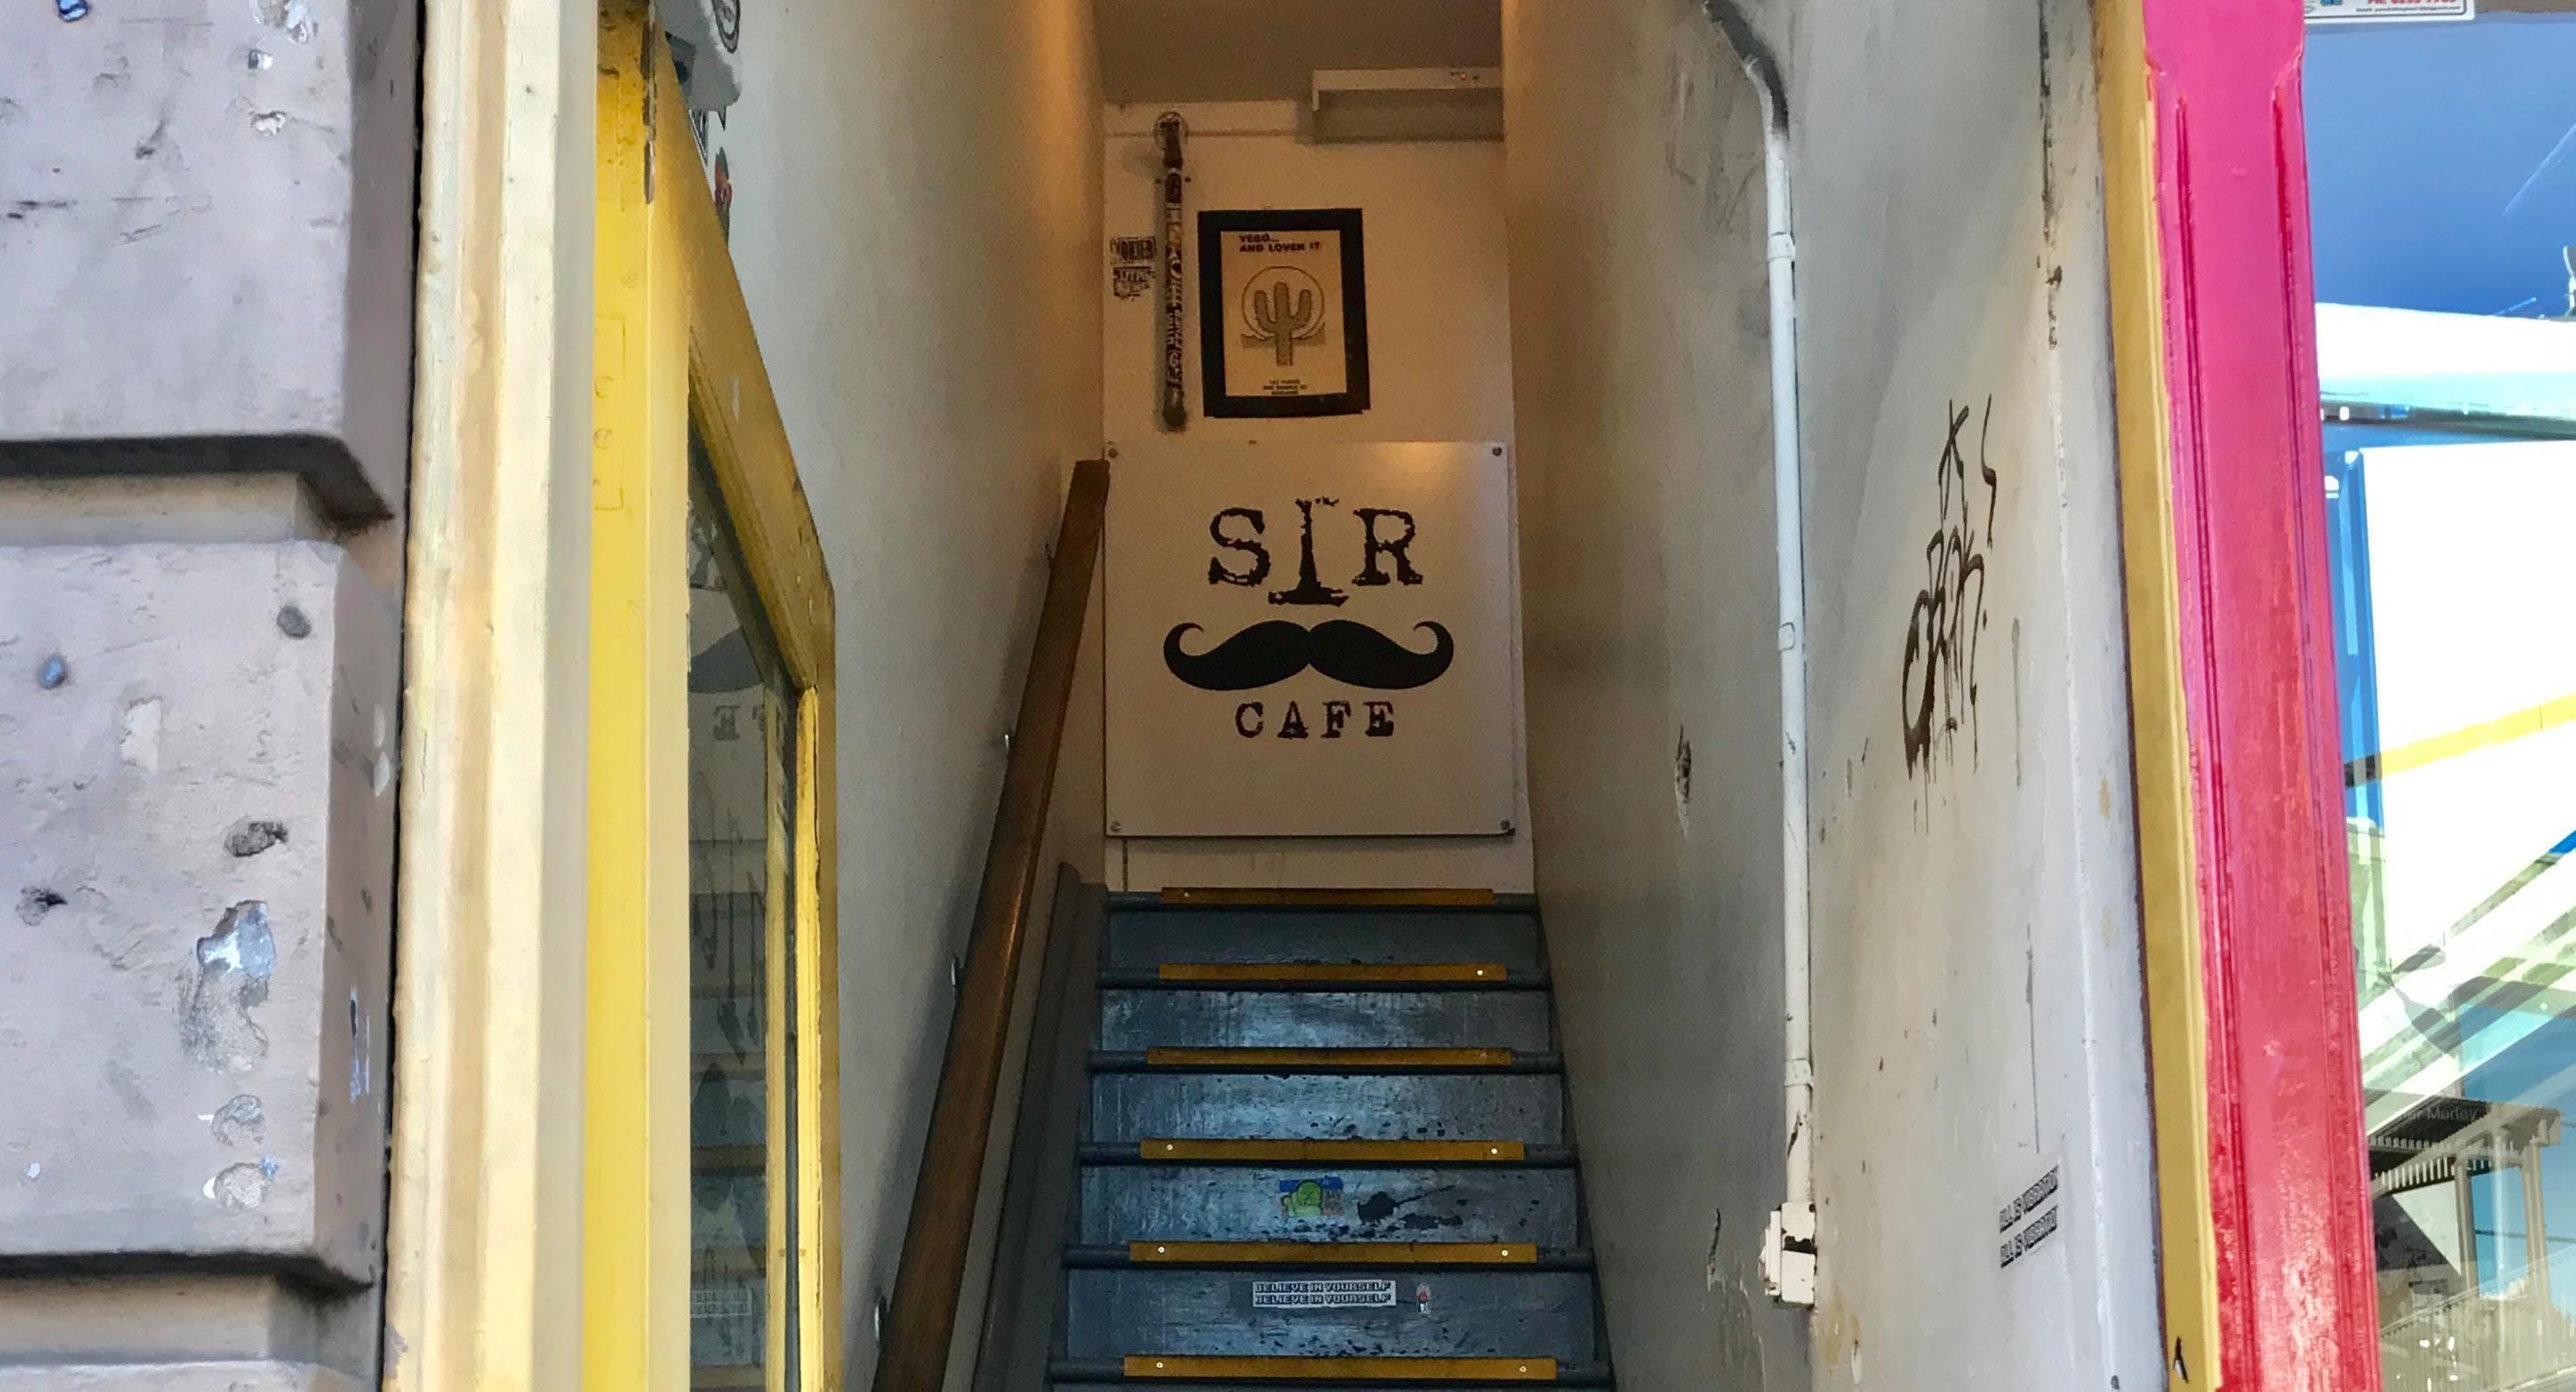 Sir Cafe & Bar